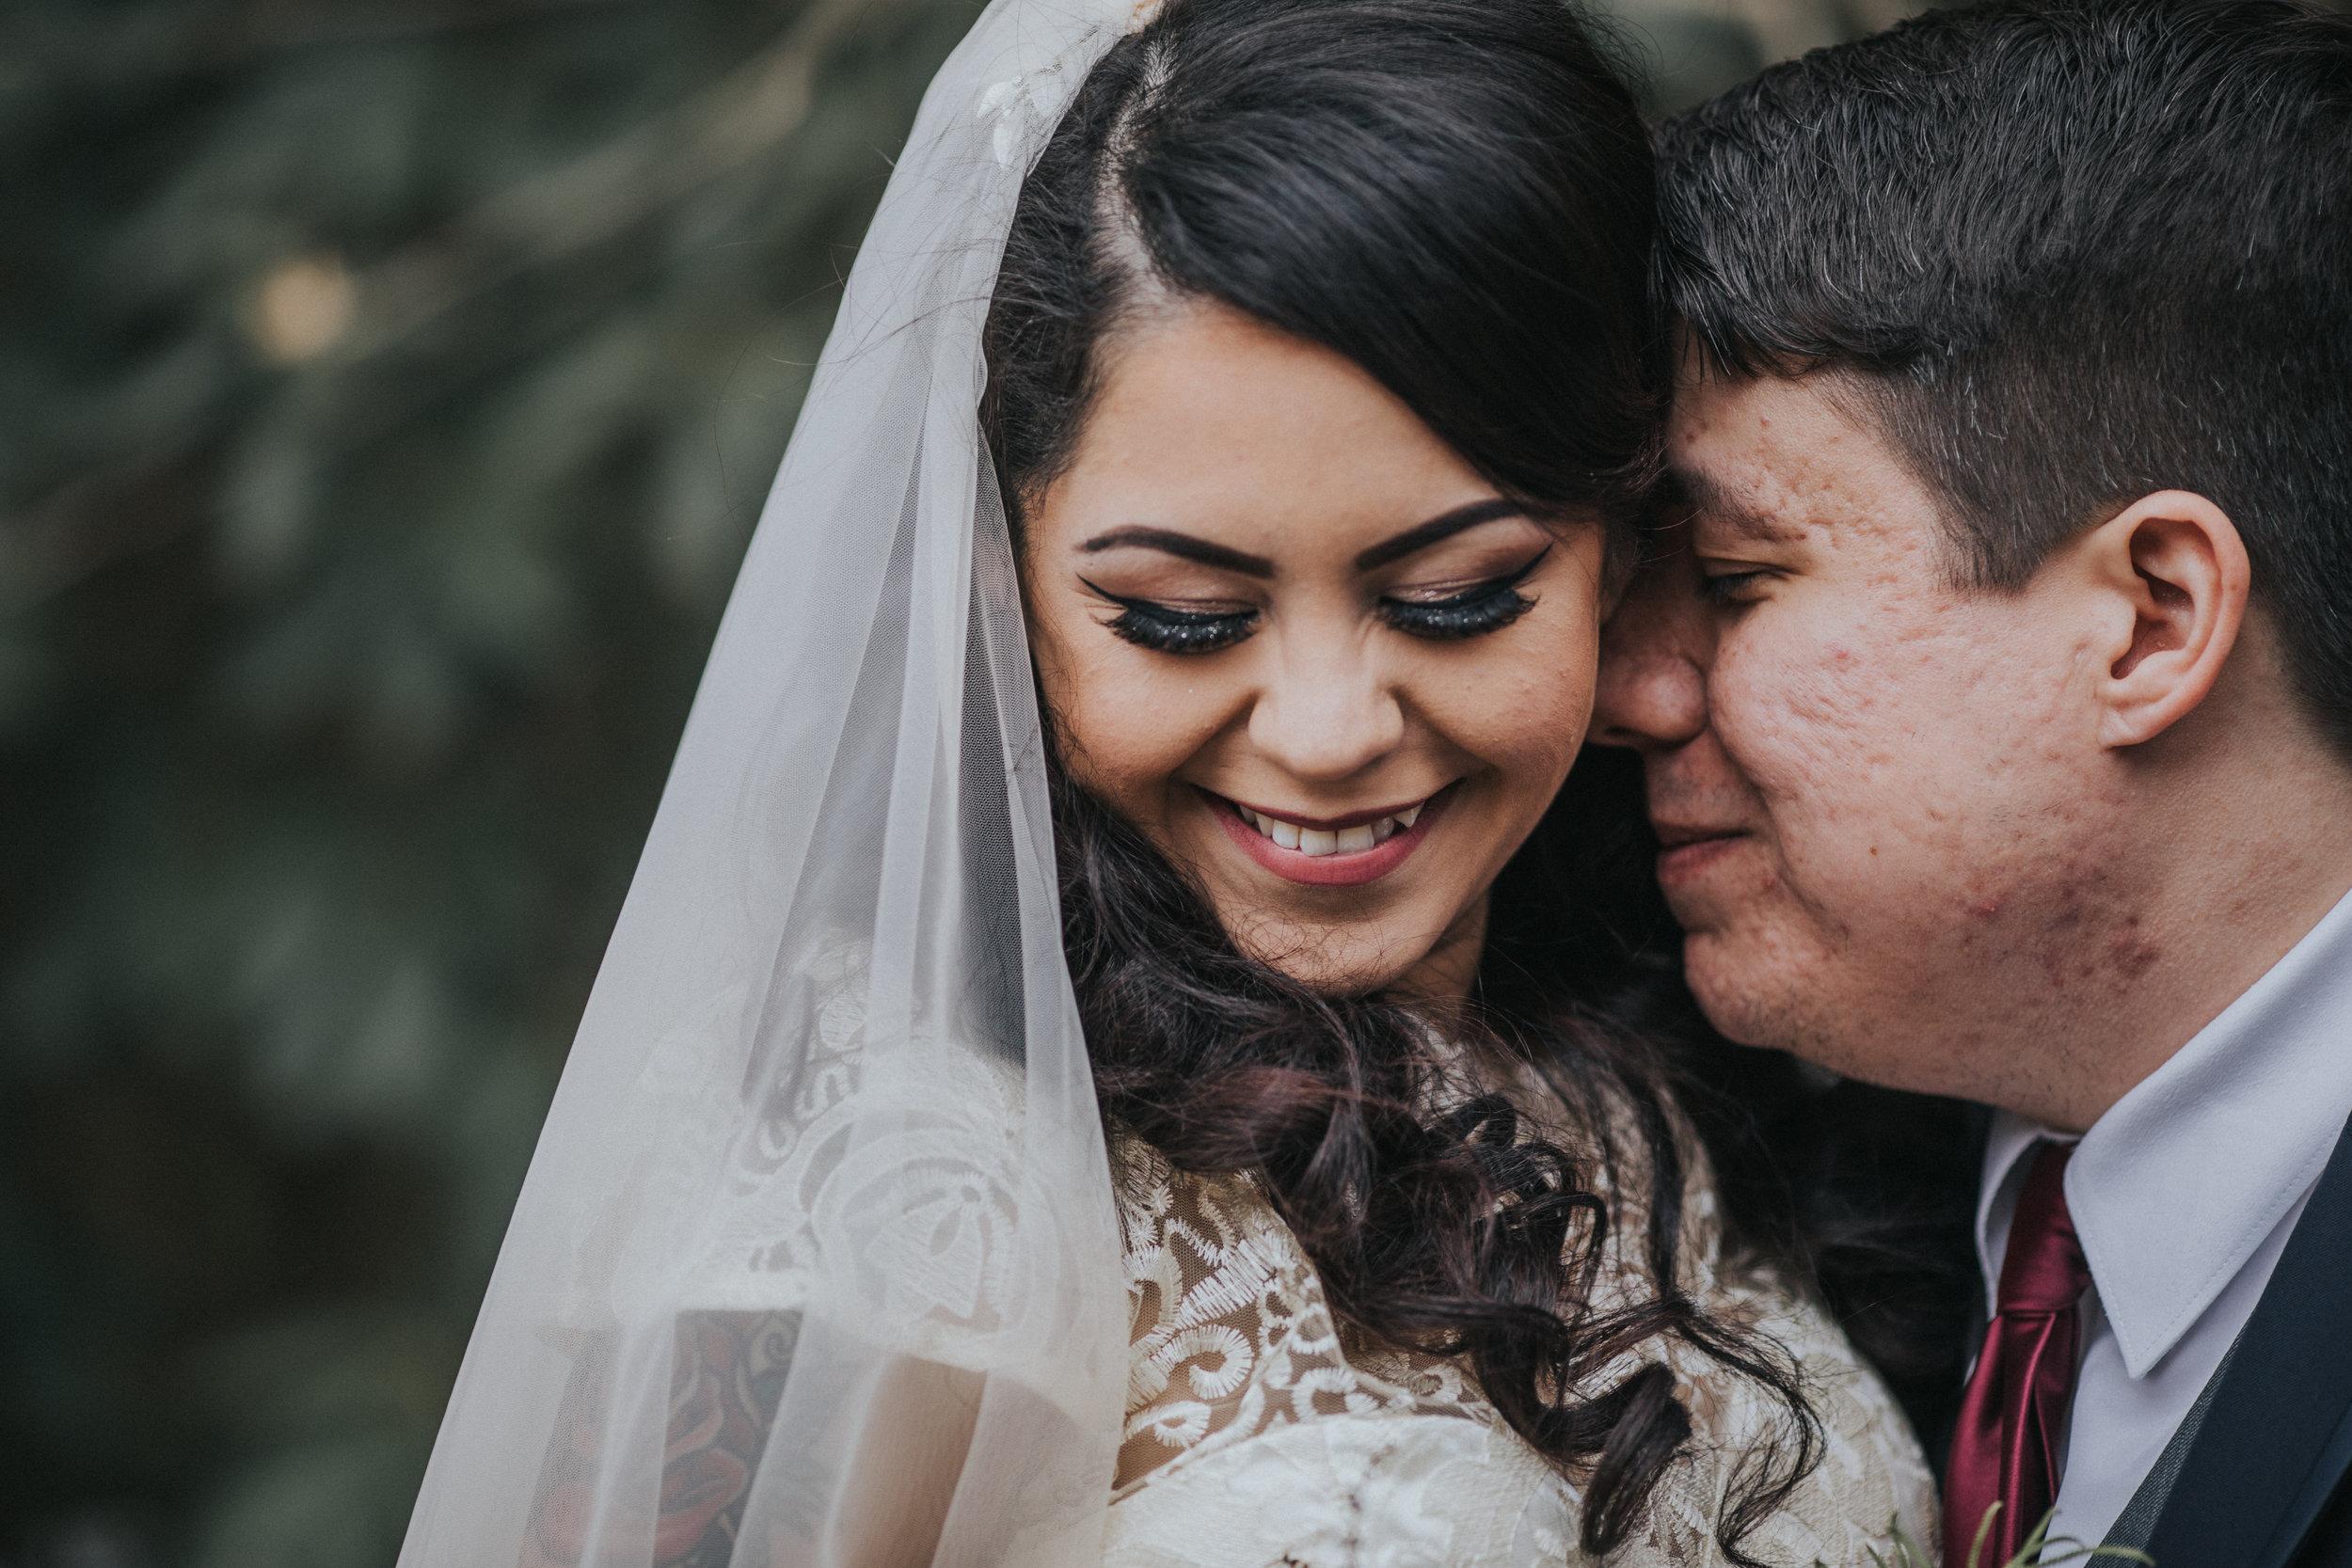 New-Jersey-Wedding-Photographer-ReceptionCenter-Valeria&Mike-First-Look-Bride&Groom (30 of 69).jpg